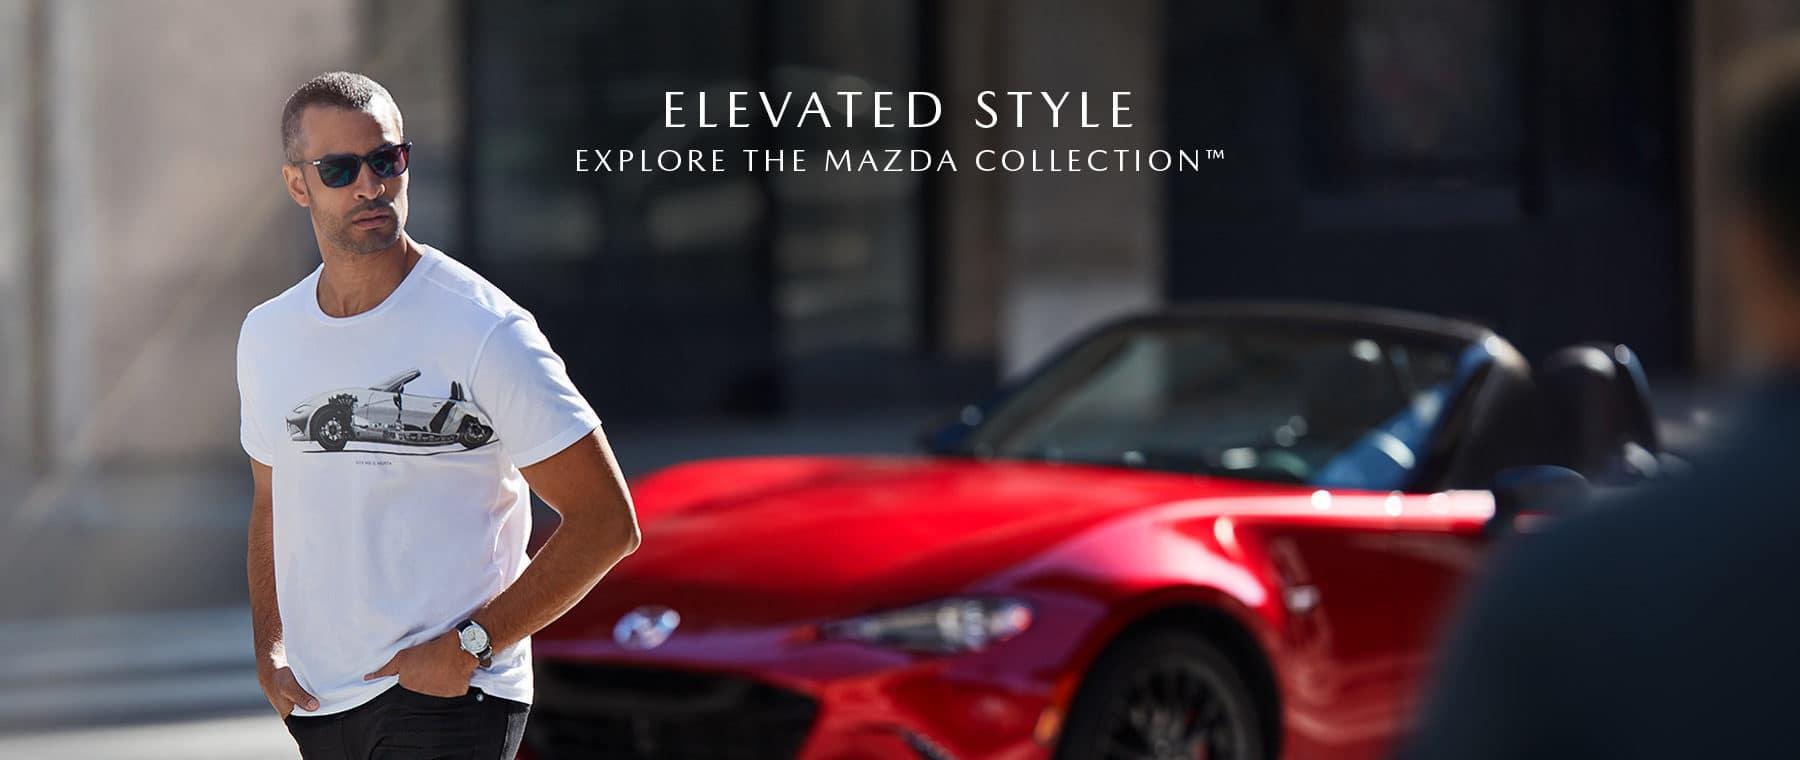 Mazdacollection_Desktop_1800x760